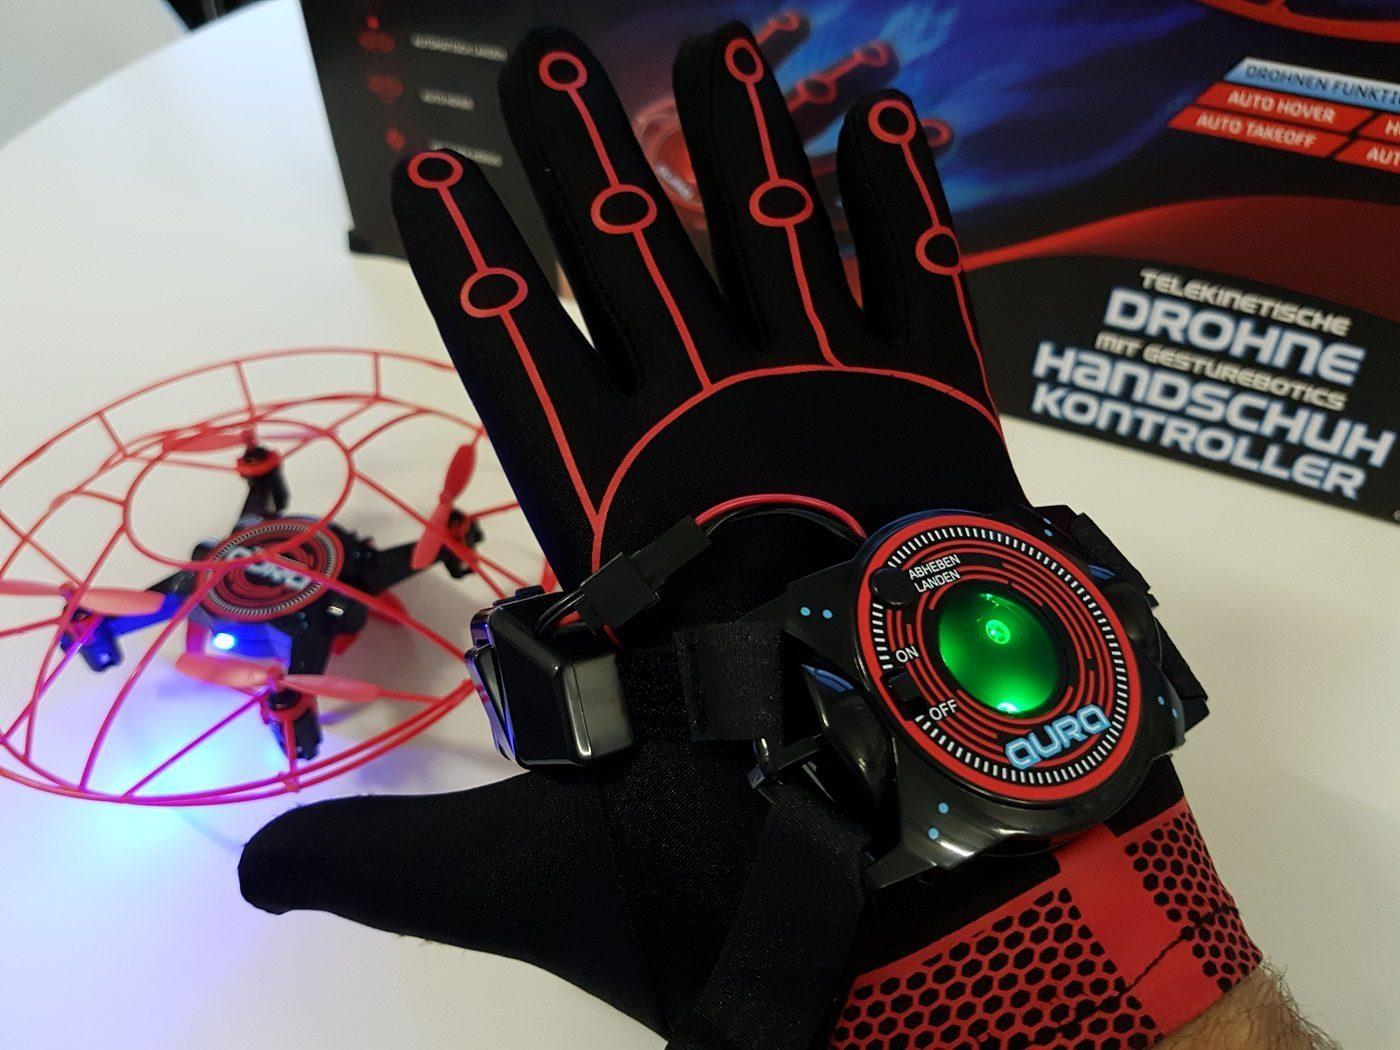 Aura gestengesteuerte Drohne Set